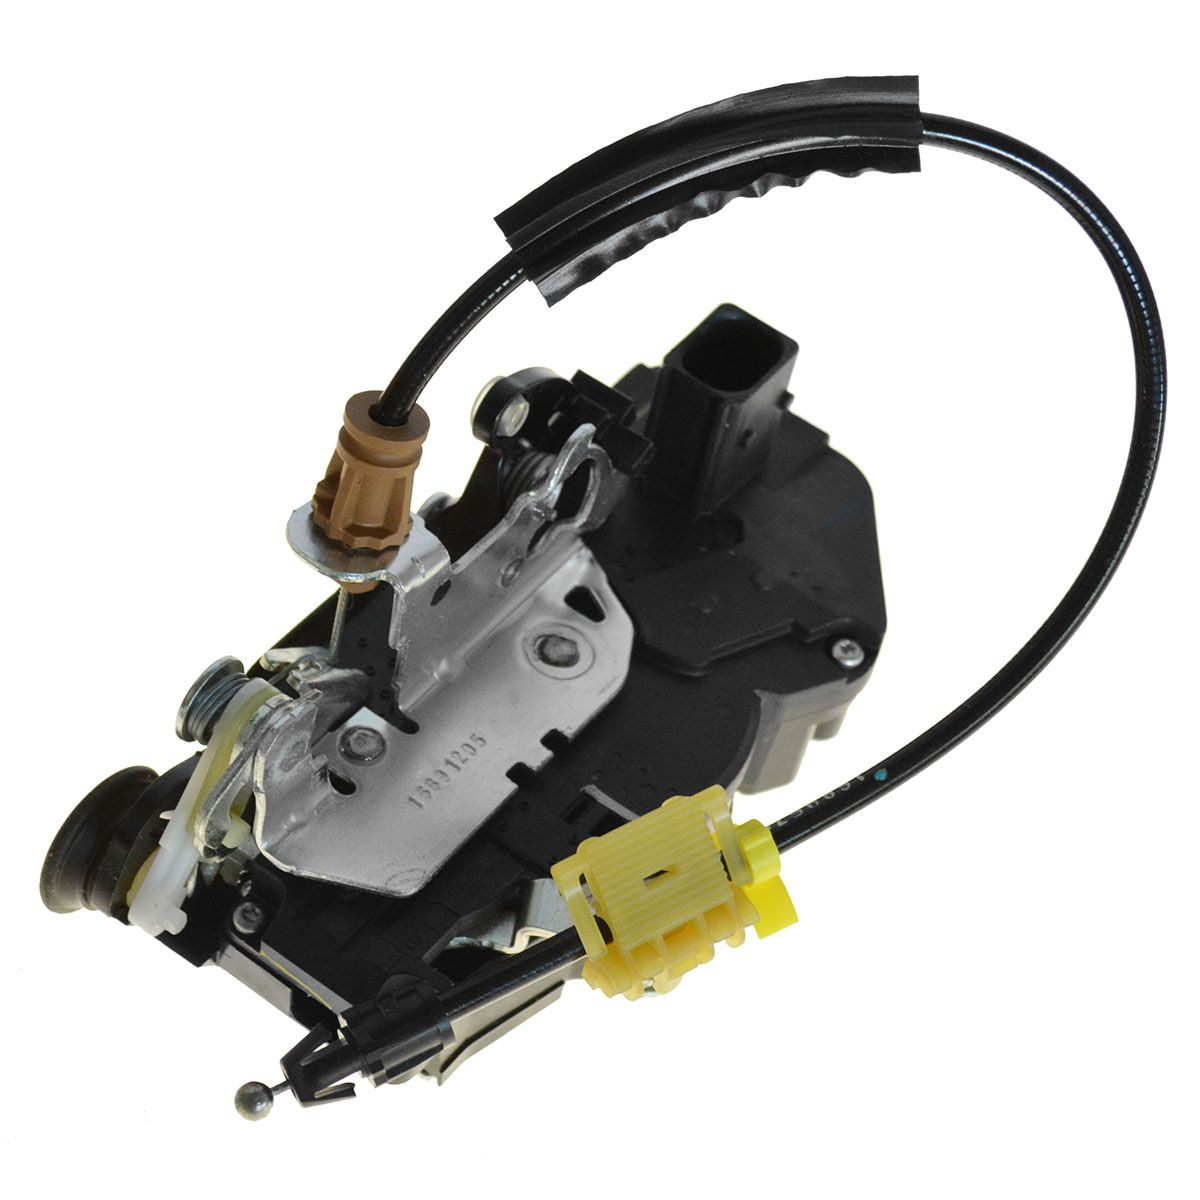 Gm Power Door Lock Actuator Latch Rear Left Lh For Silverado Sierra Crew Cab Ebay